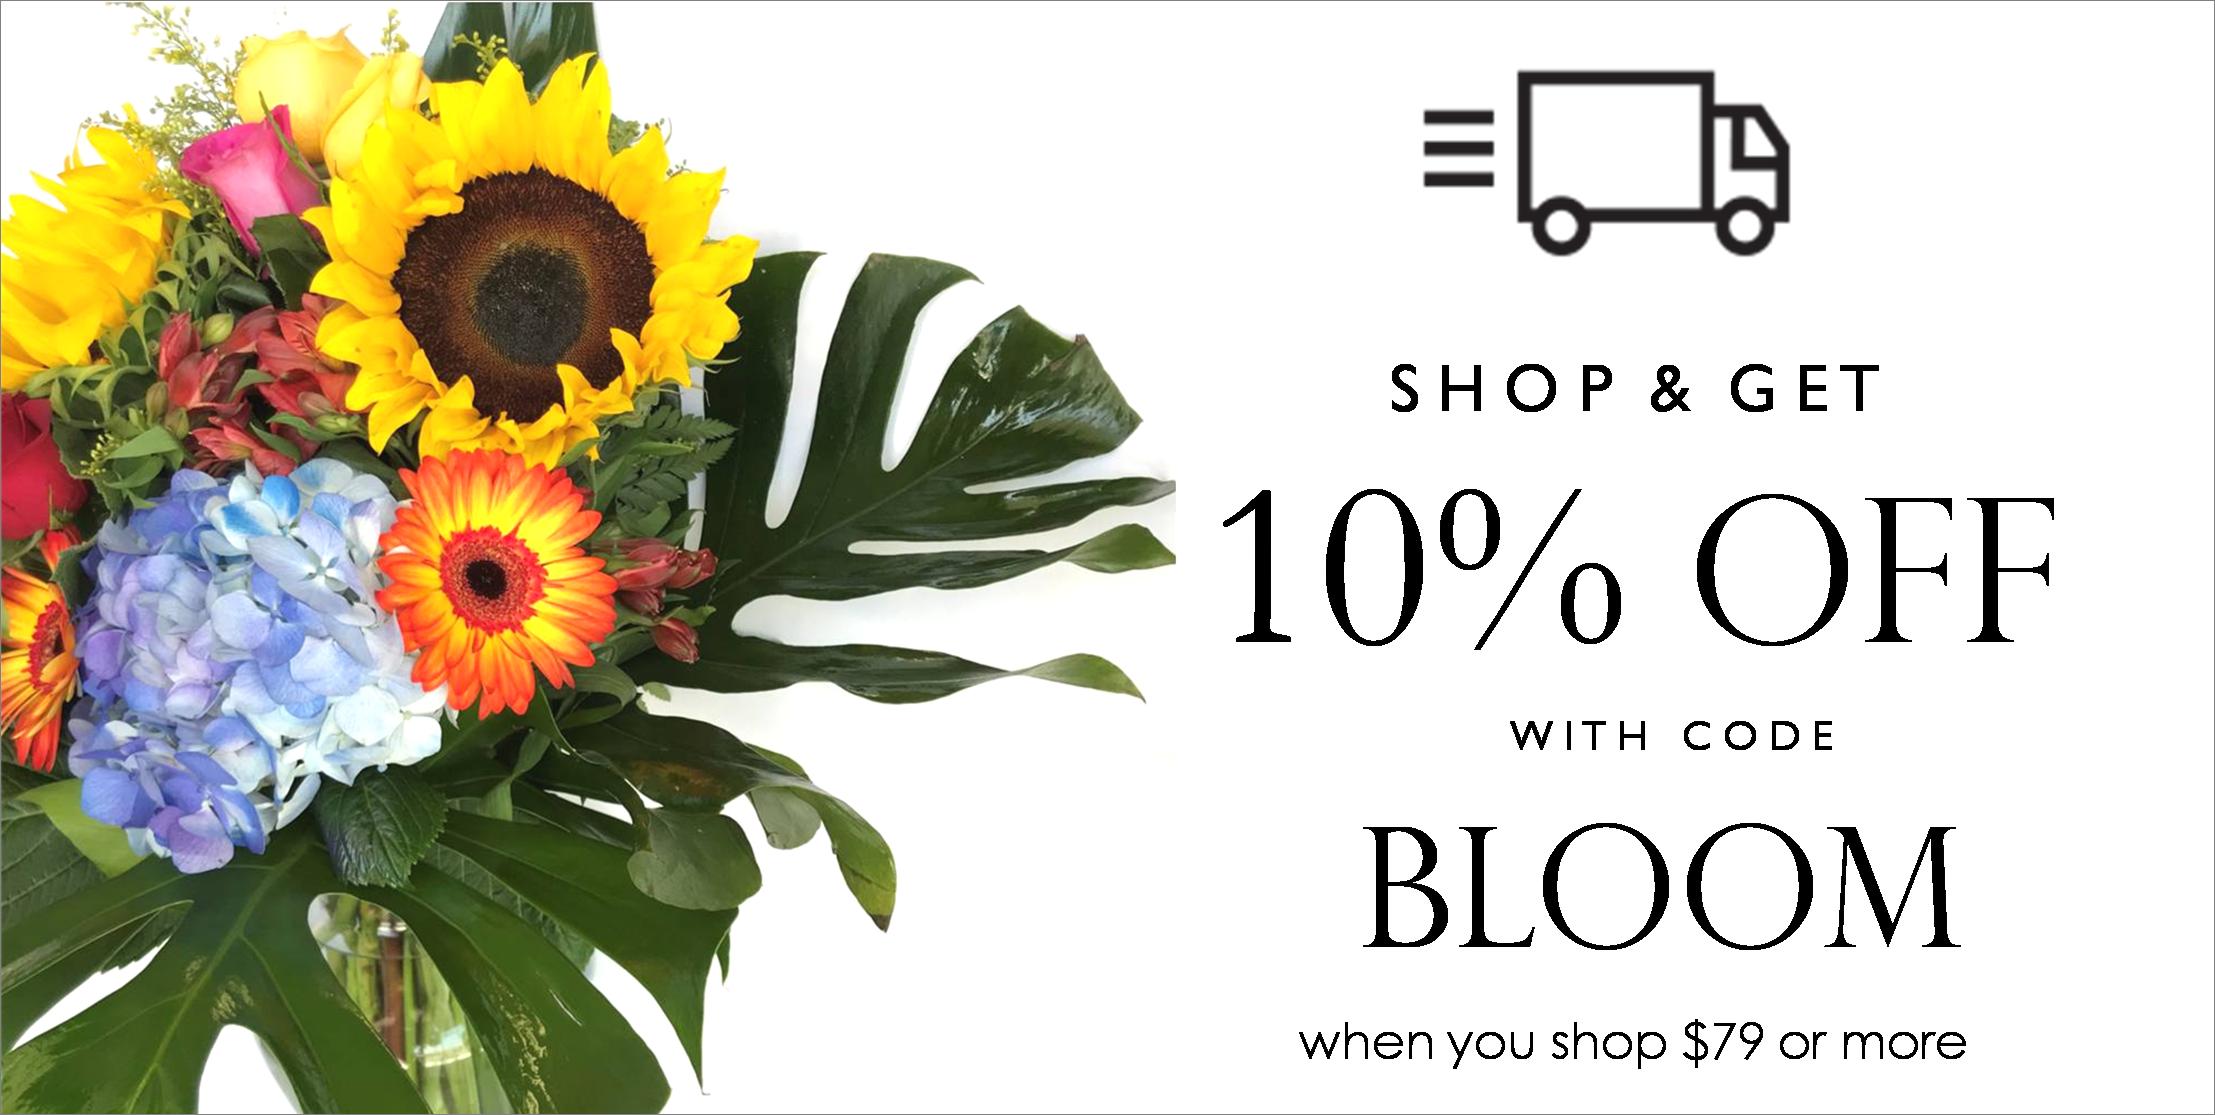 fall-favorites-autumn-angies-floral-designs-el-paso-1-texas-angies-flower-tx-el-paso-sunflower-love-flower-tx-shop-79912-angies-florals-el-paso-flower-florist-79912-west-el-paso.jpg.png